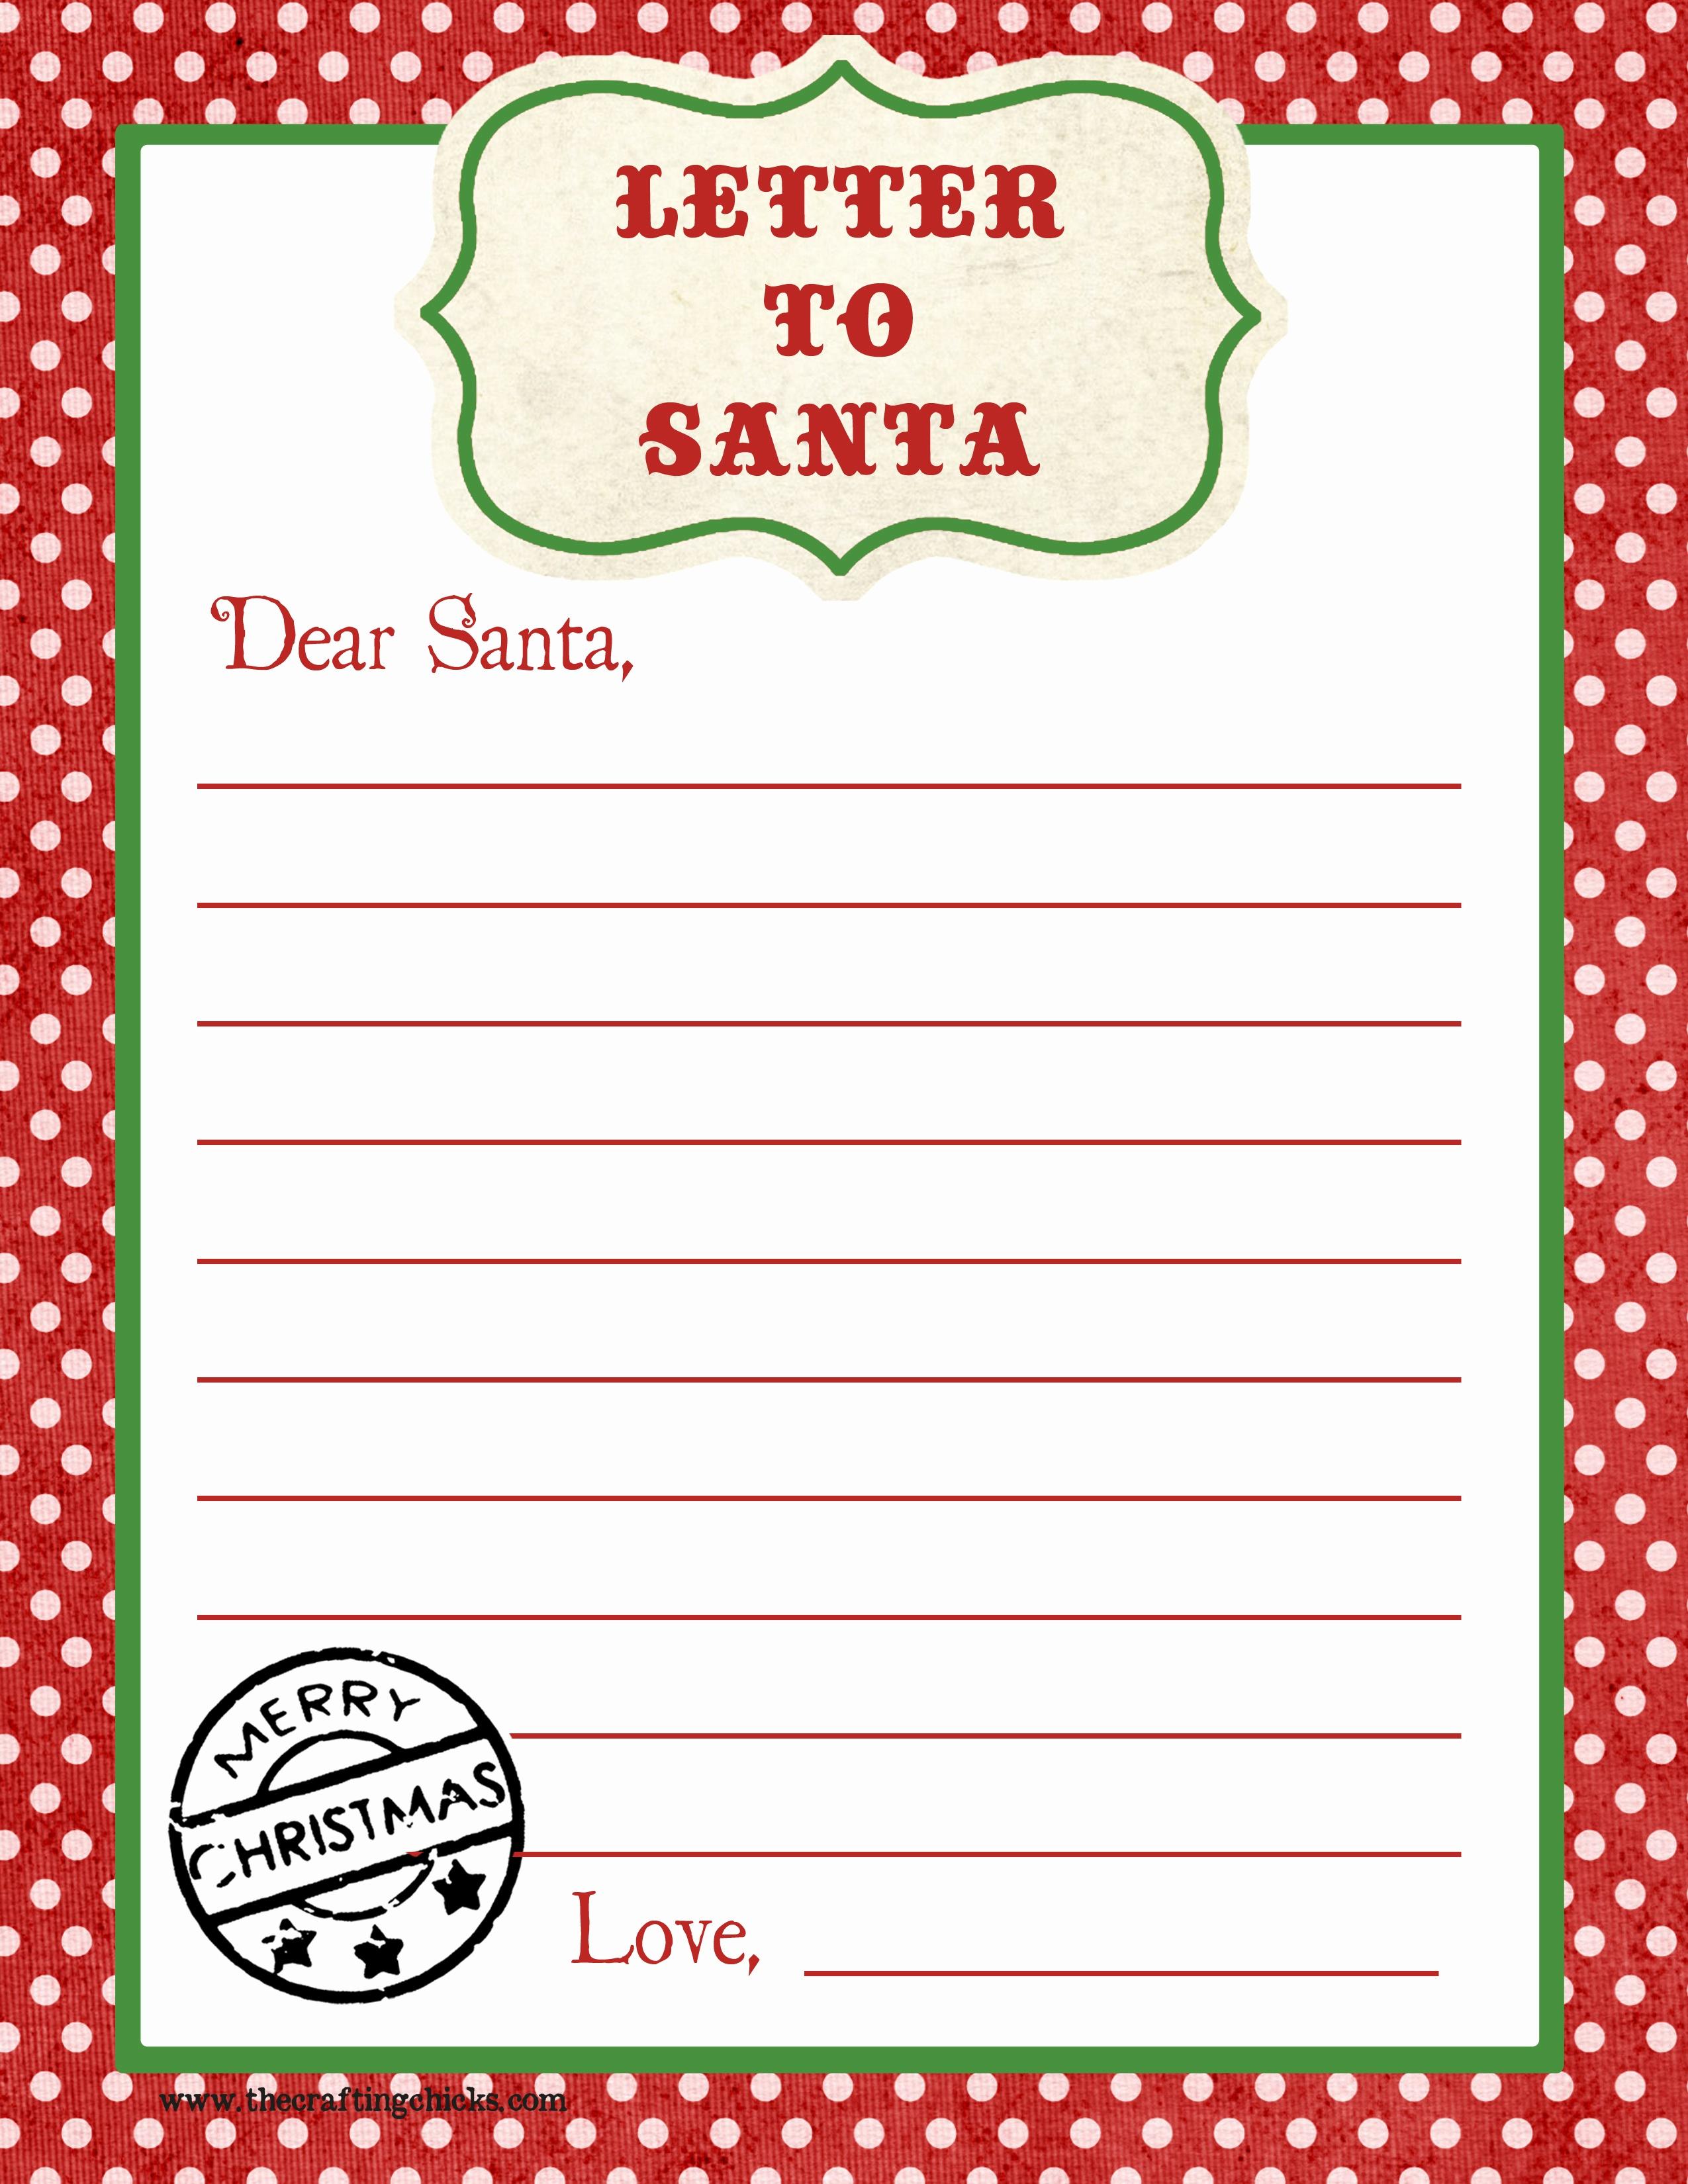 Free Printable Santa Letterhead Paper Letter To Santa Free Printable - Free Printable Santa Letter Paper